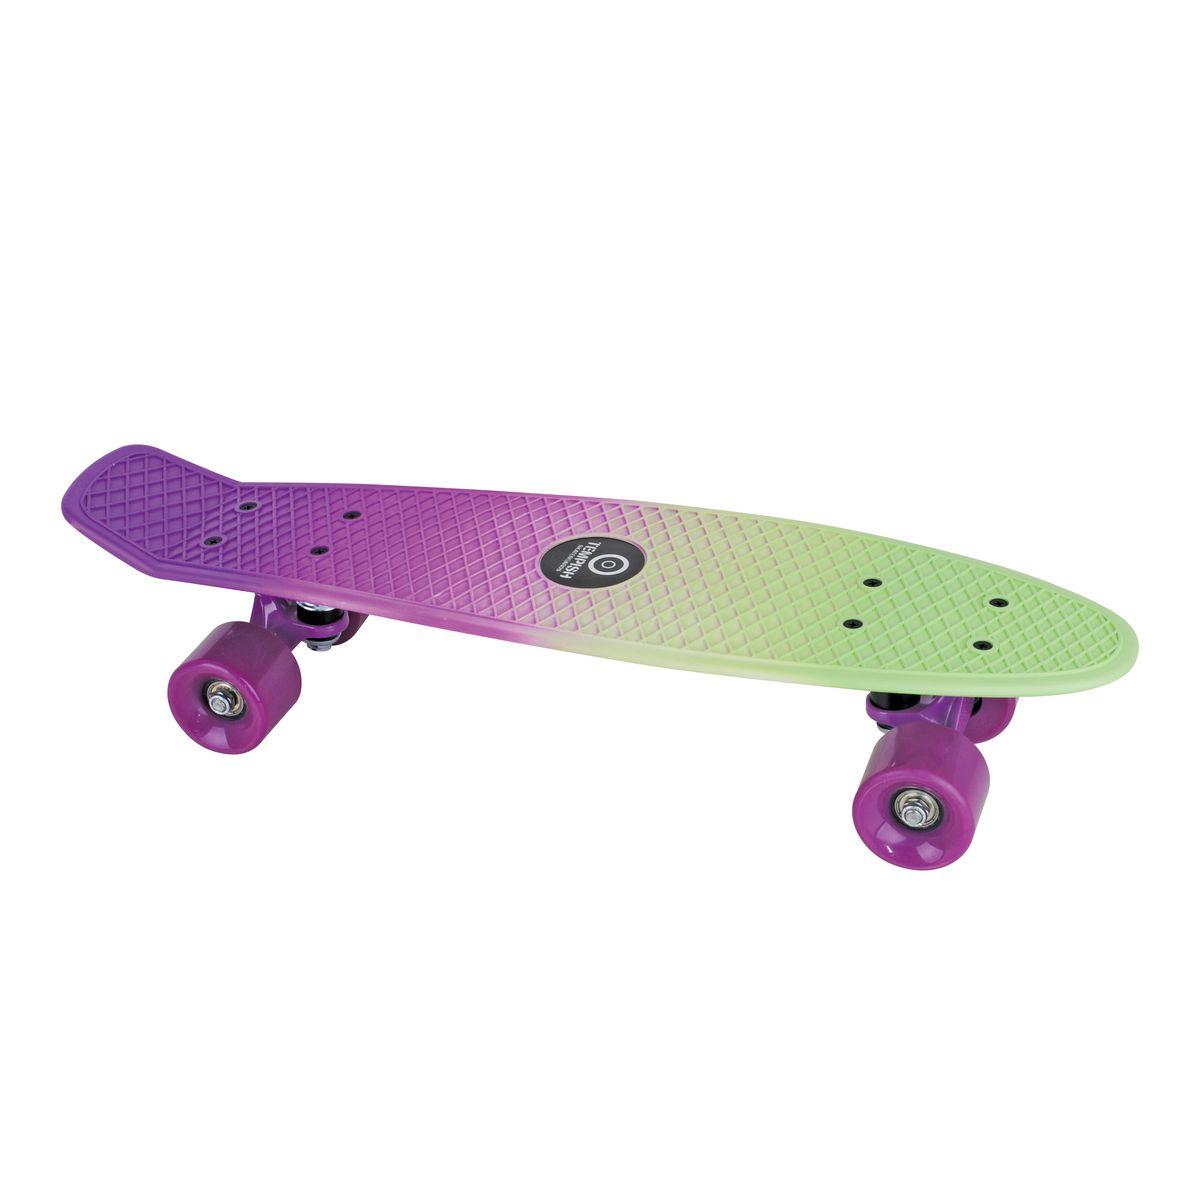 Скейтборд пластиковый Tempish Buffy Sweet, цвет: фиолетовыйGESS-131Пени борд Tempish Buffy нагрузка до 100 кг